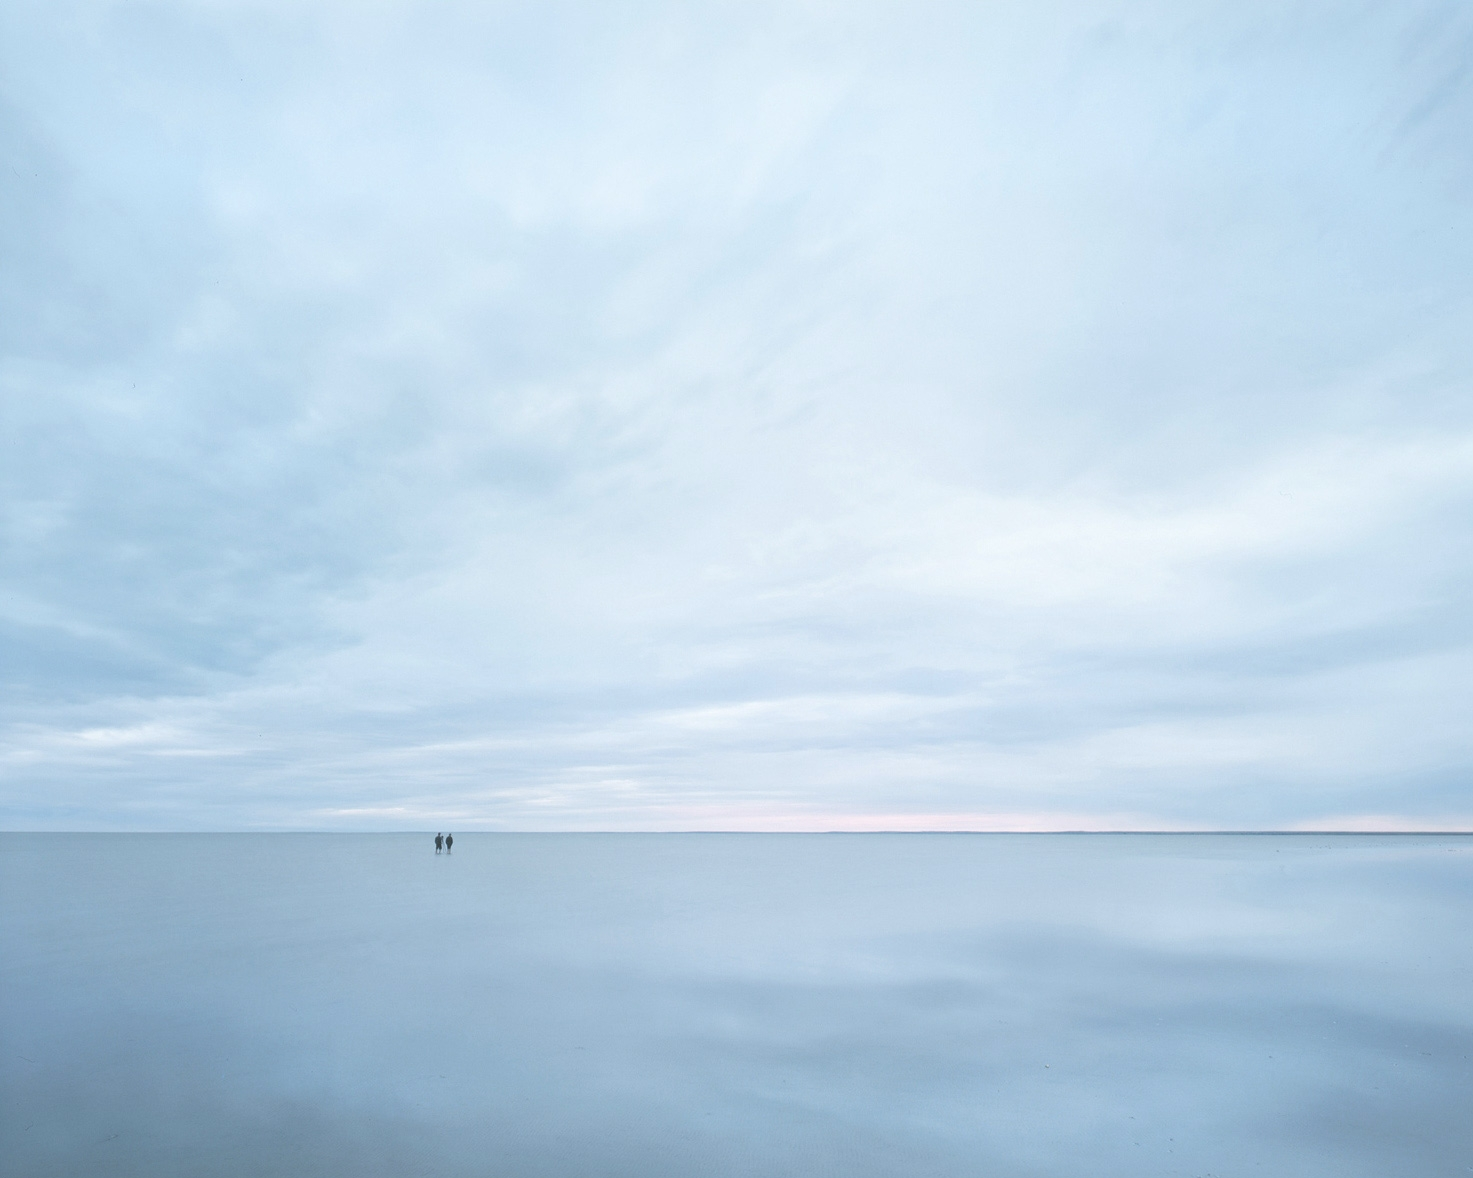 #3,Lake Eyre, 2011